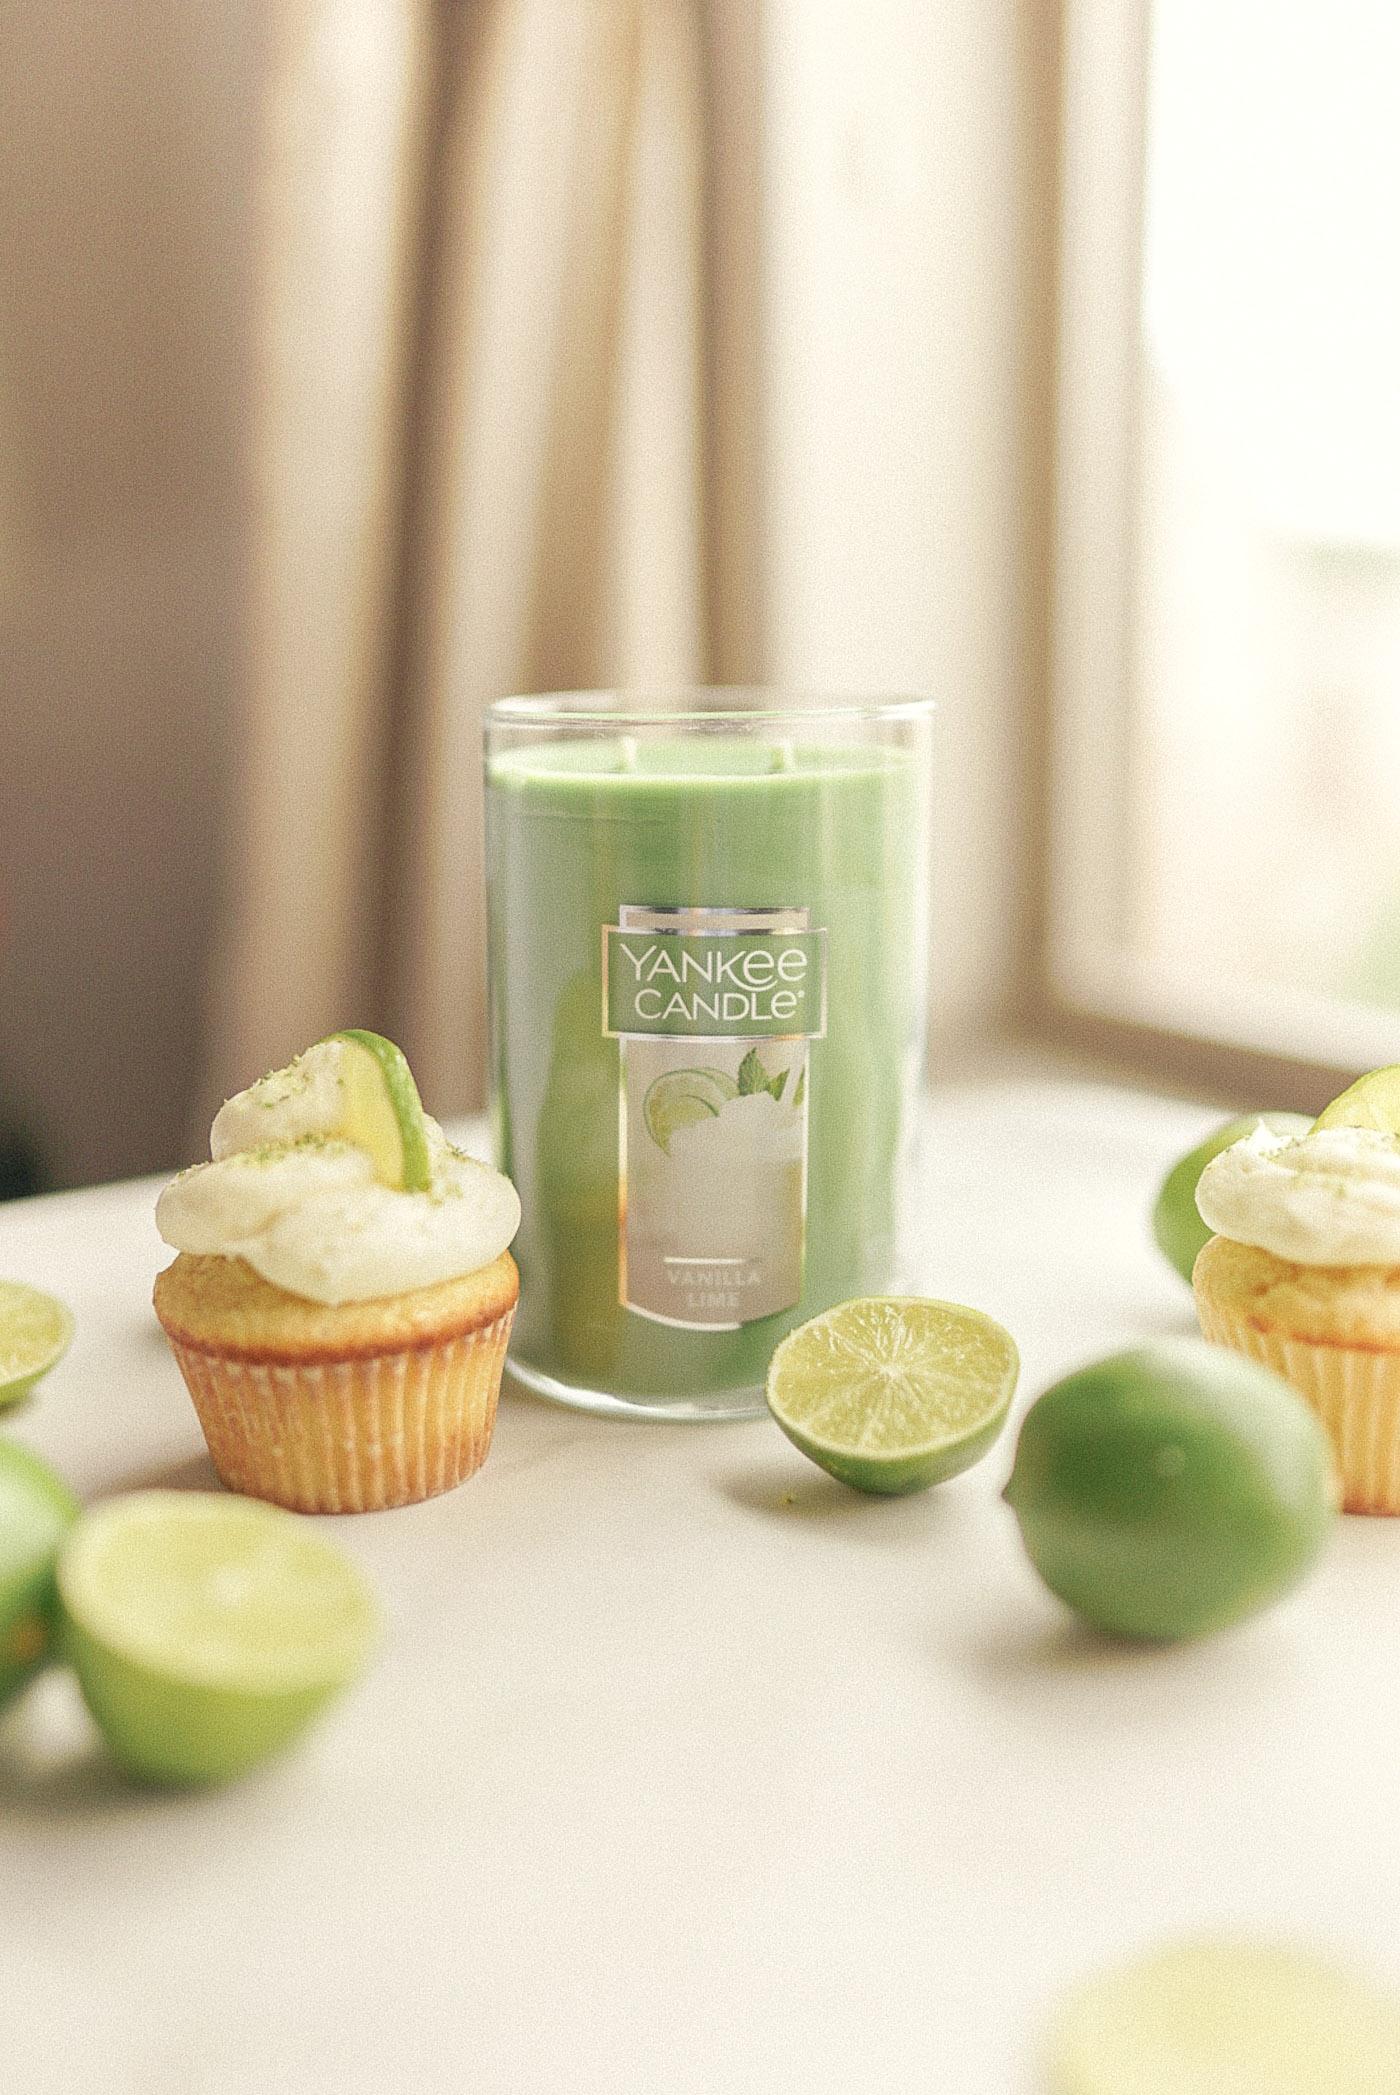 vanilla-lime-yankee-candle